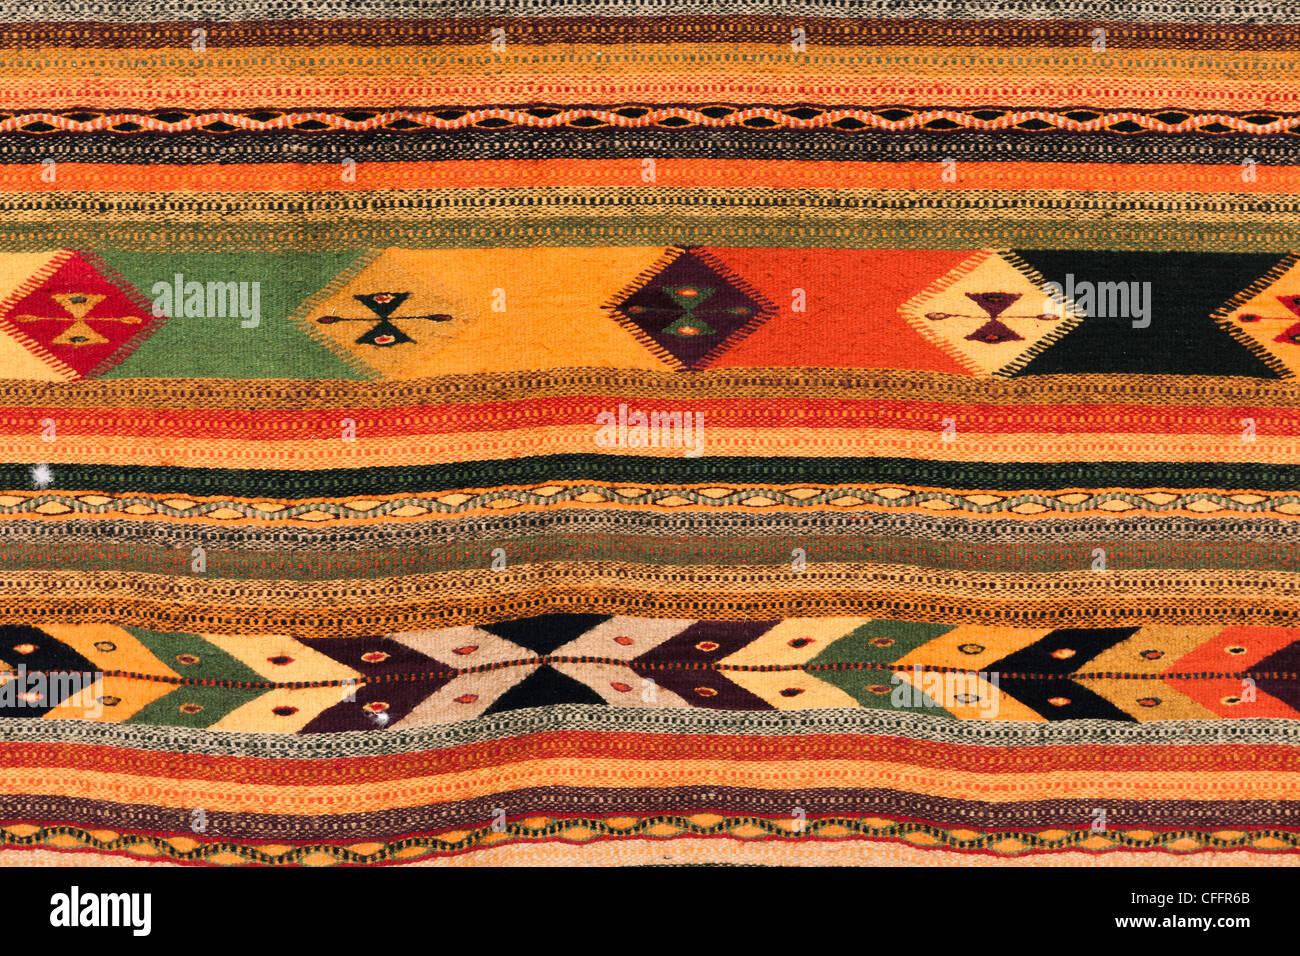 Native Indian rug - Stock Image